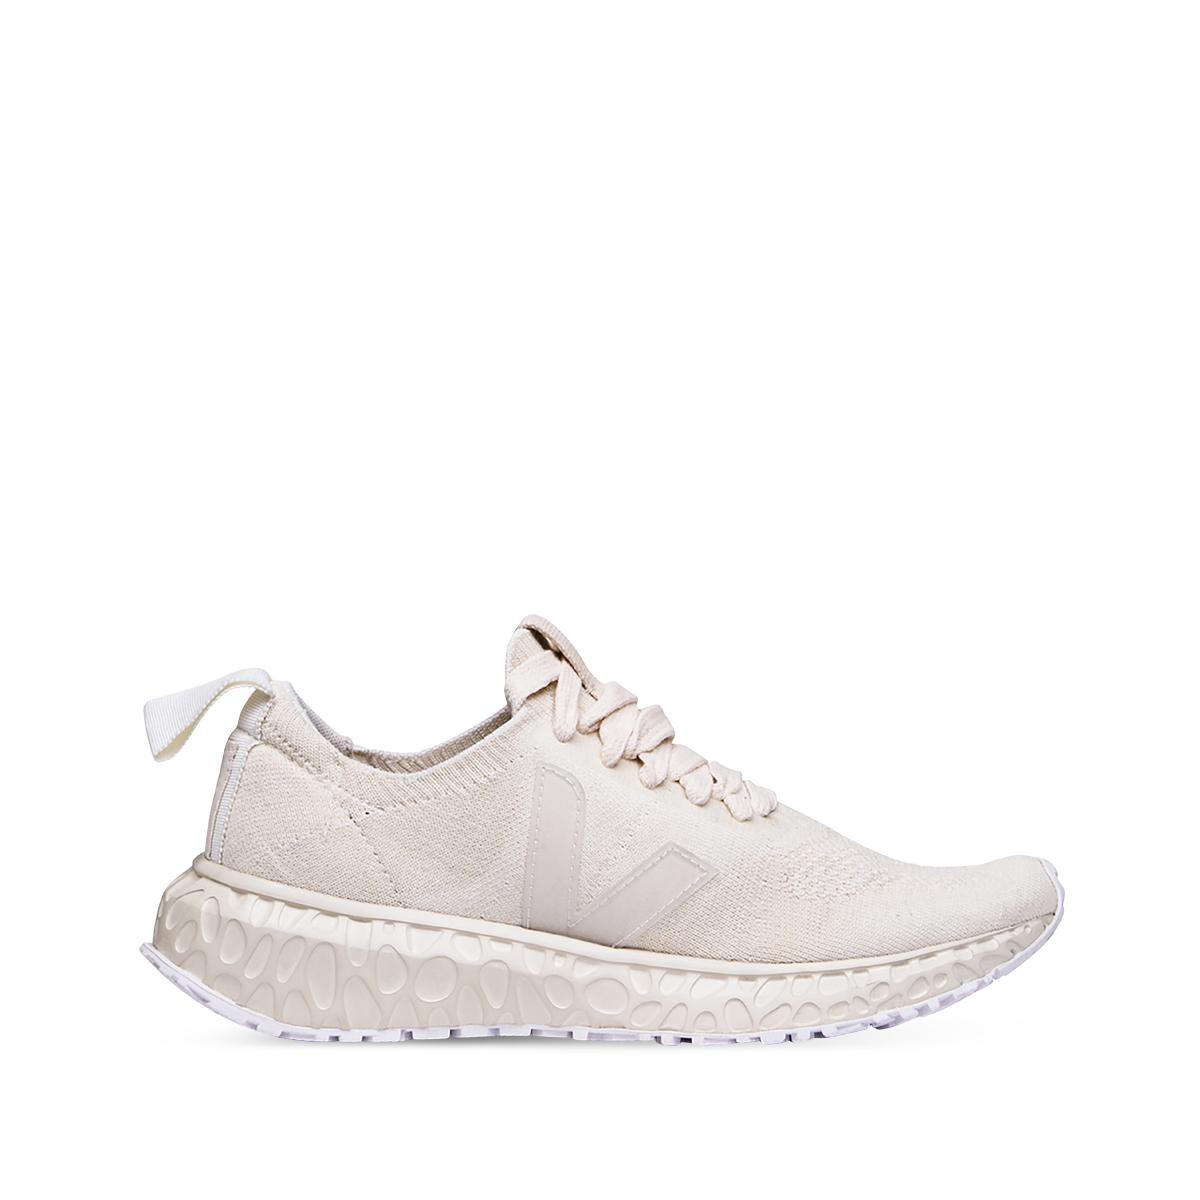 VEJA x Rick Owens Runner Style Shoe